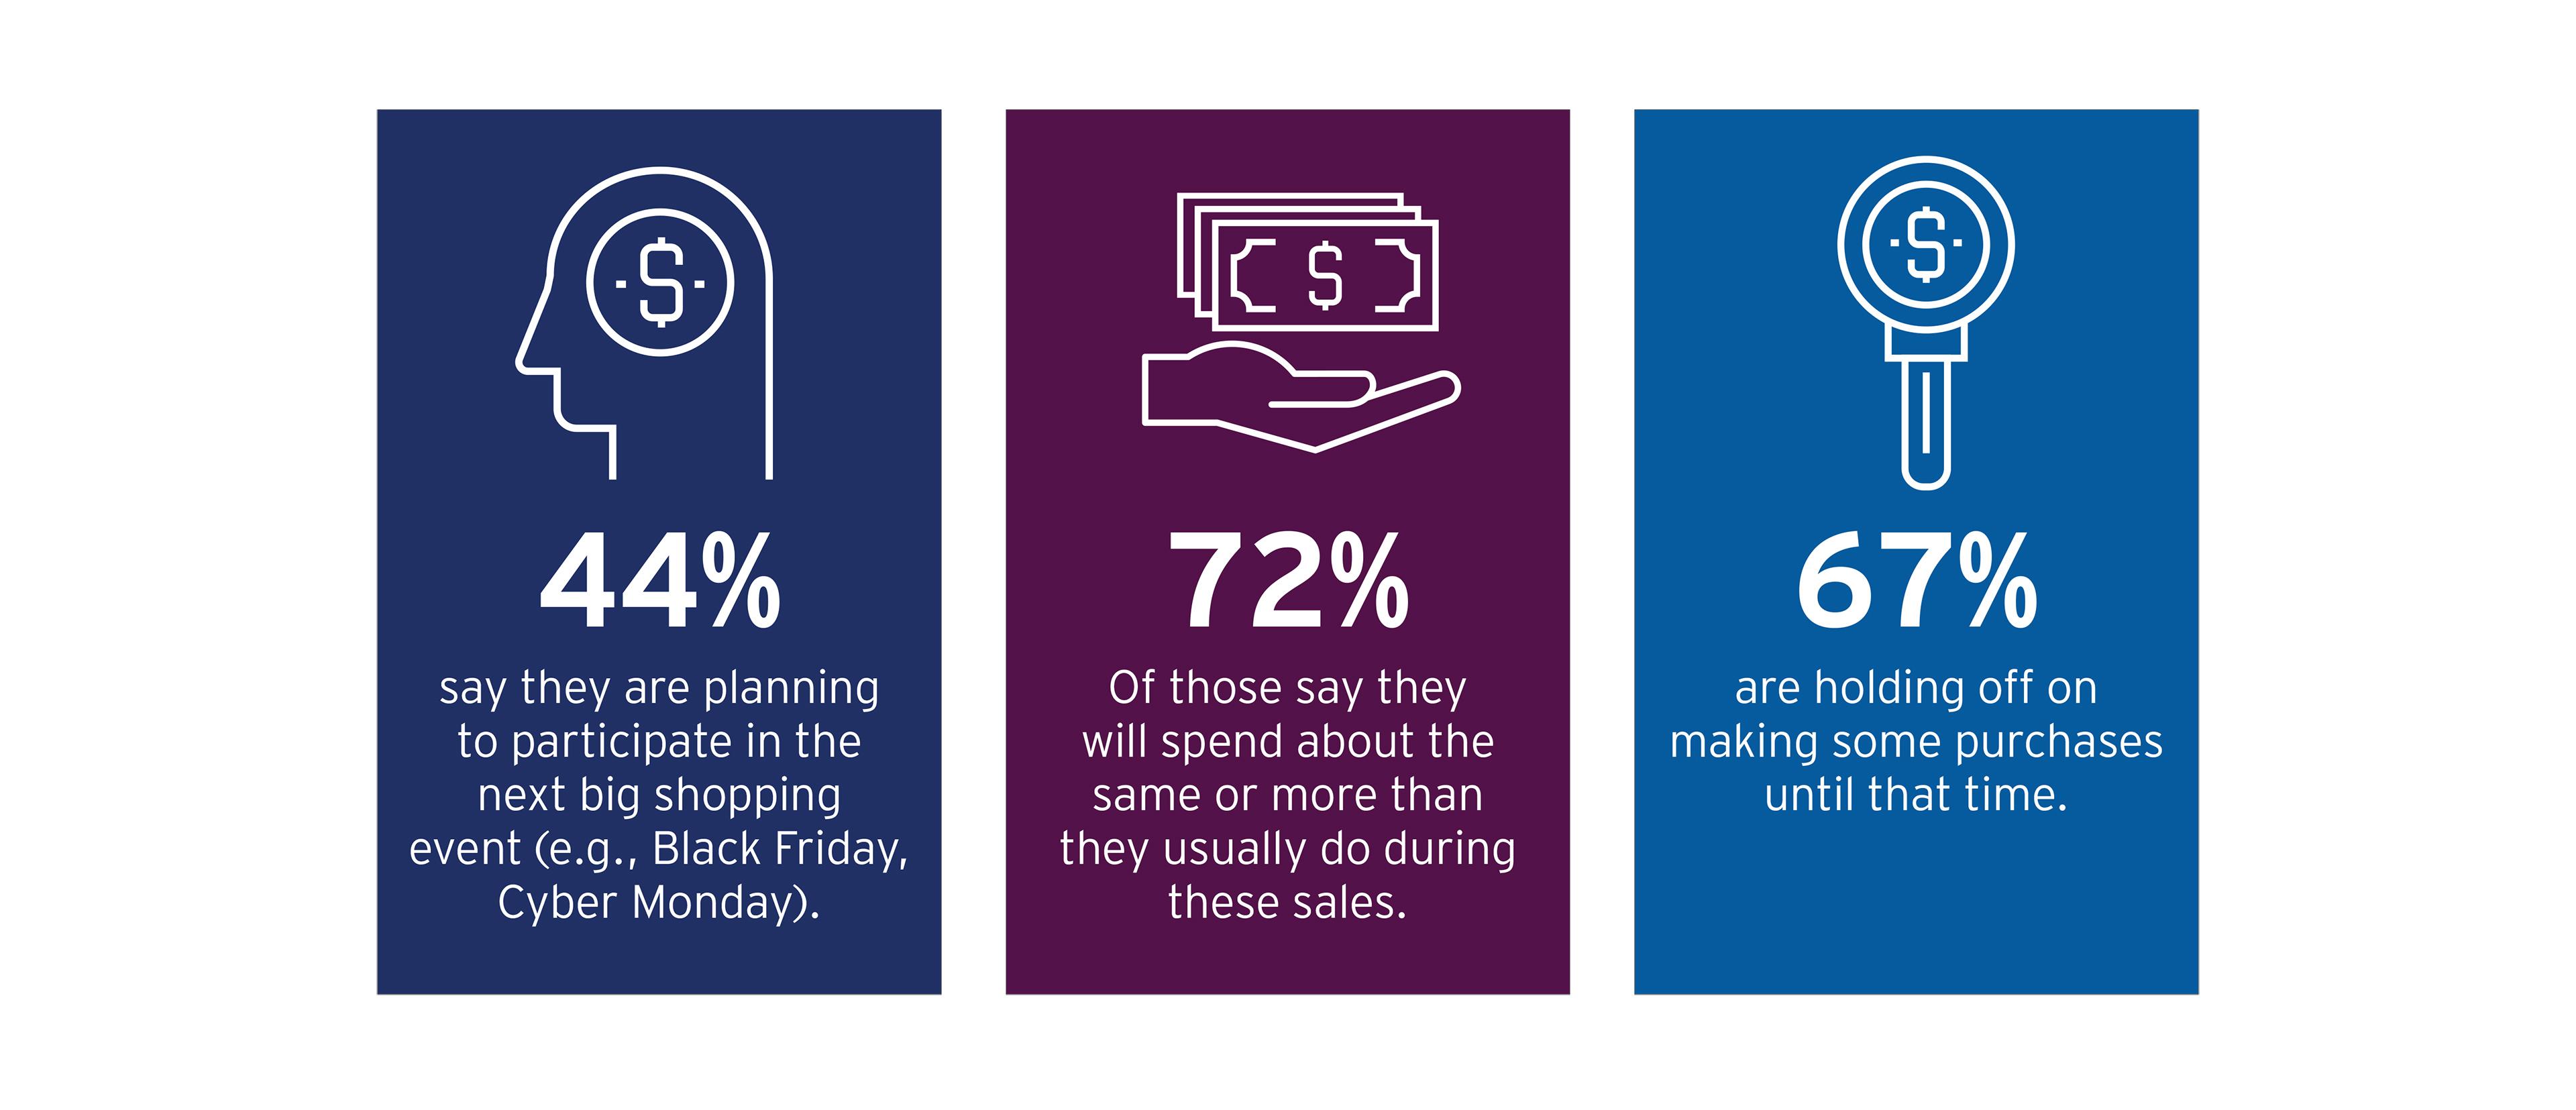 EY - Shopping statistics